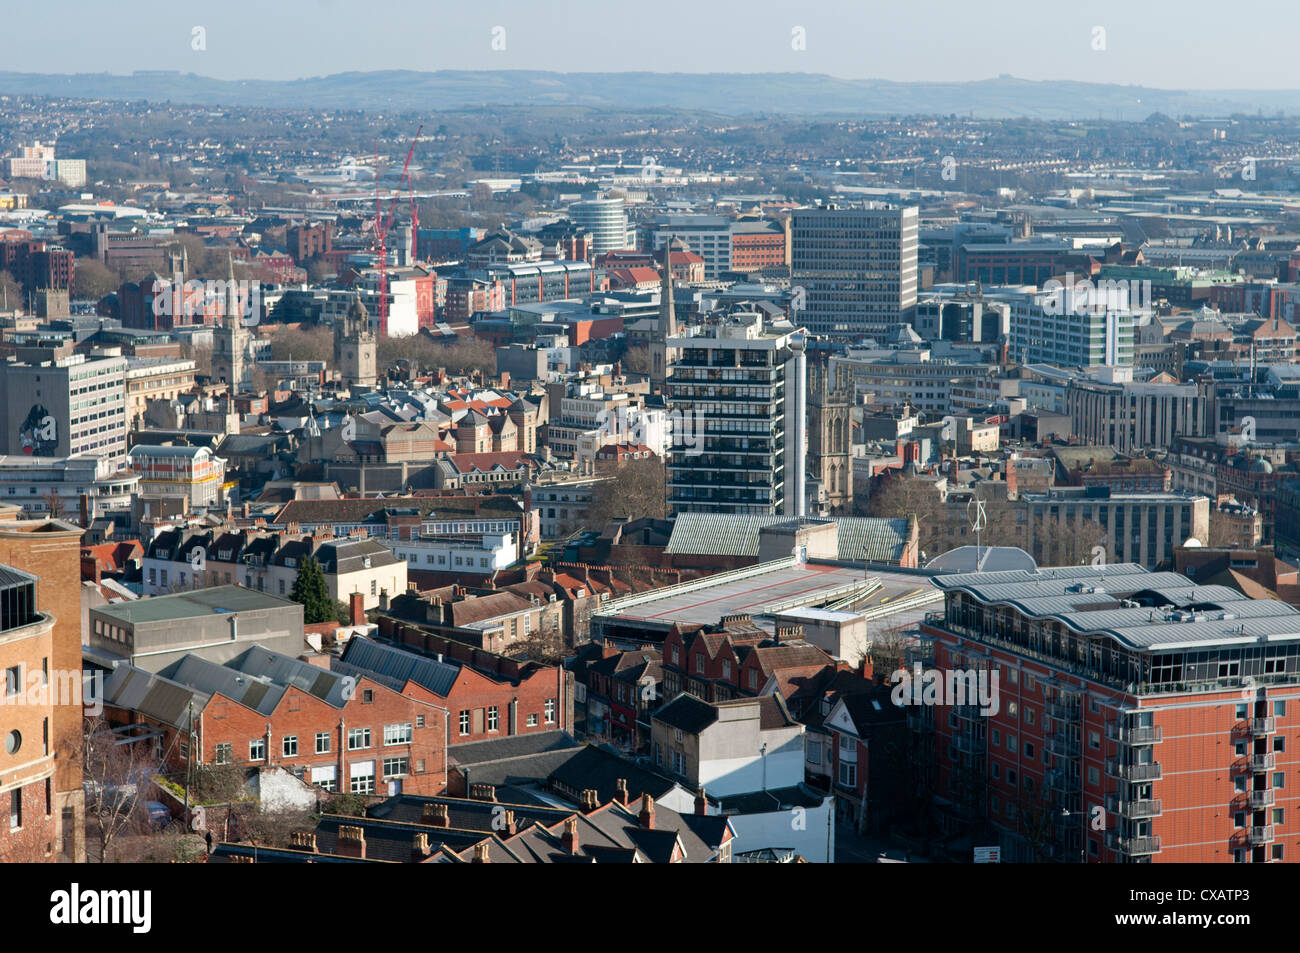 City Centre, Bristol, England, United Kingdom, Europe - Stock Image